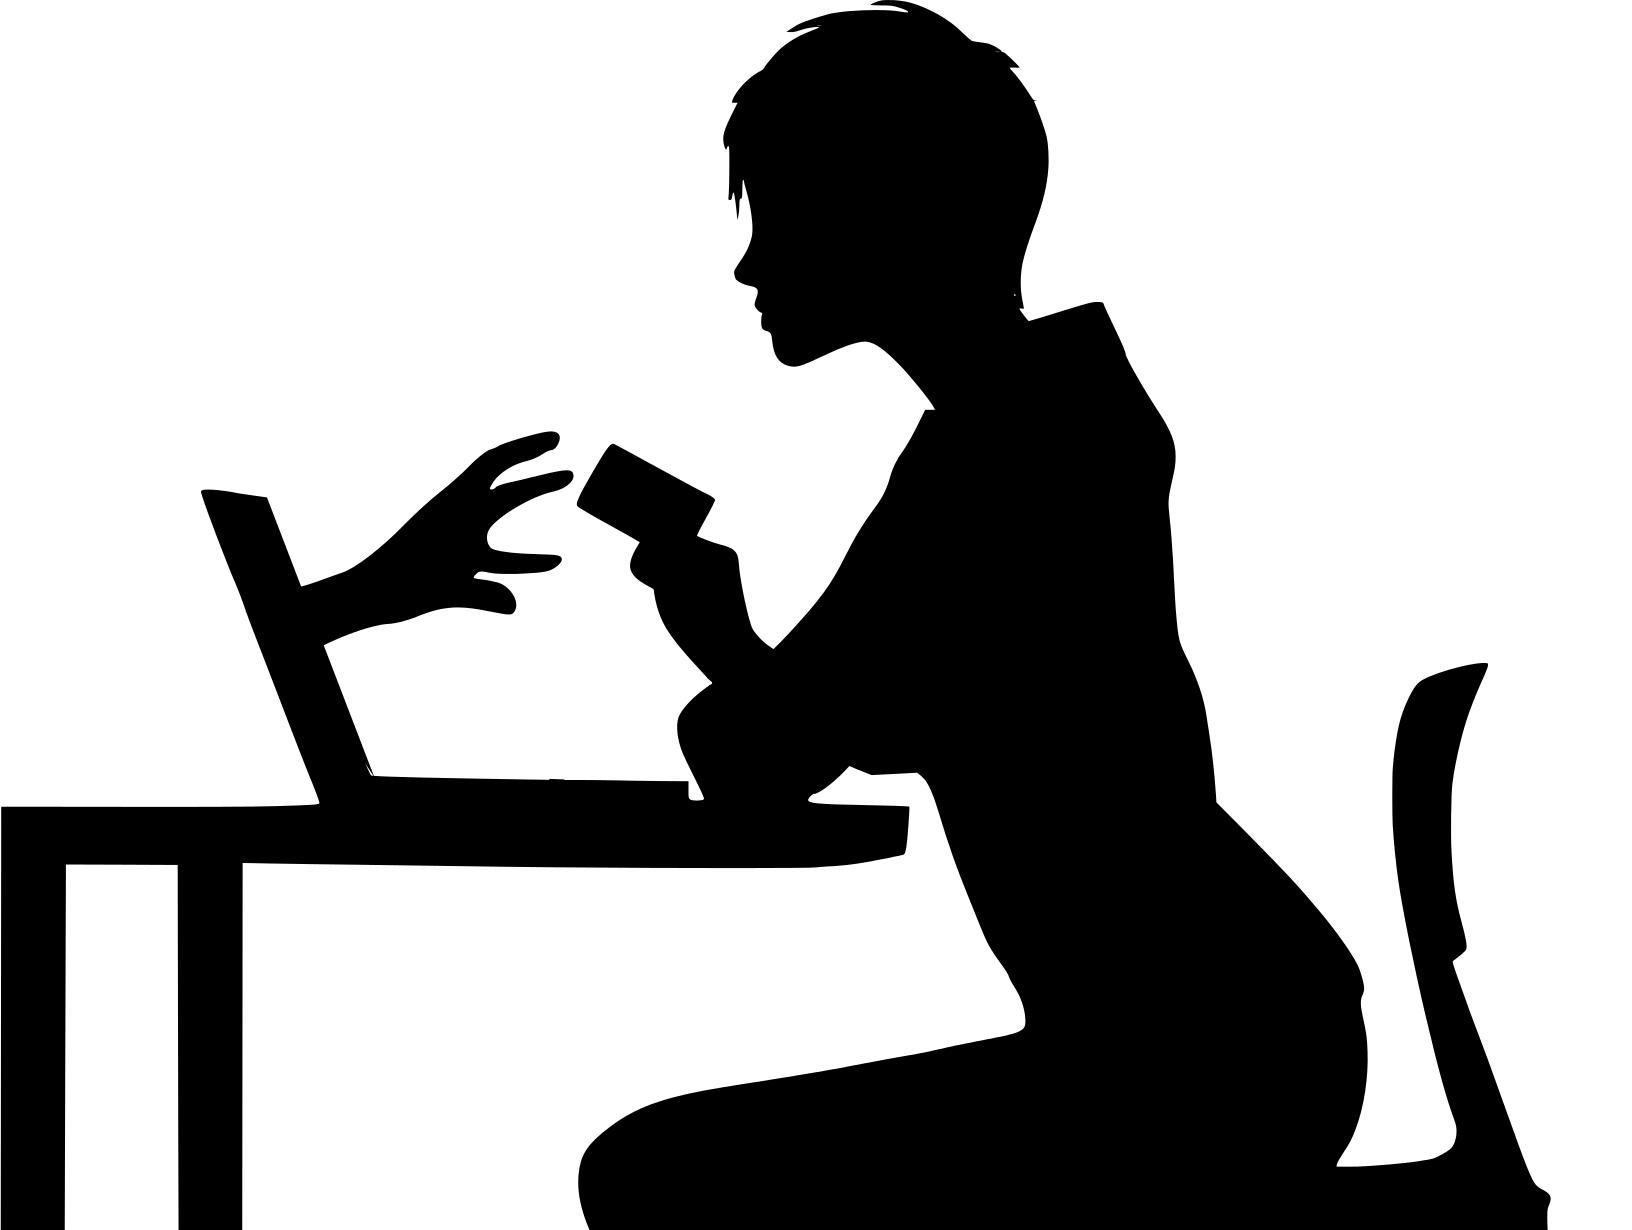 Is Teamatchaa a Scam or Untrustworthy Online Store?